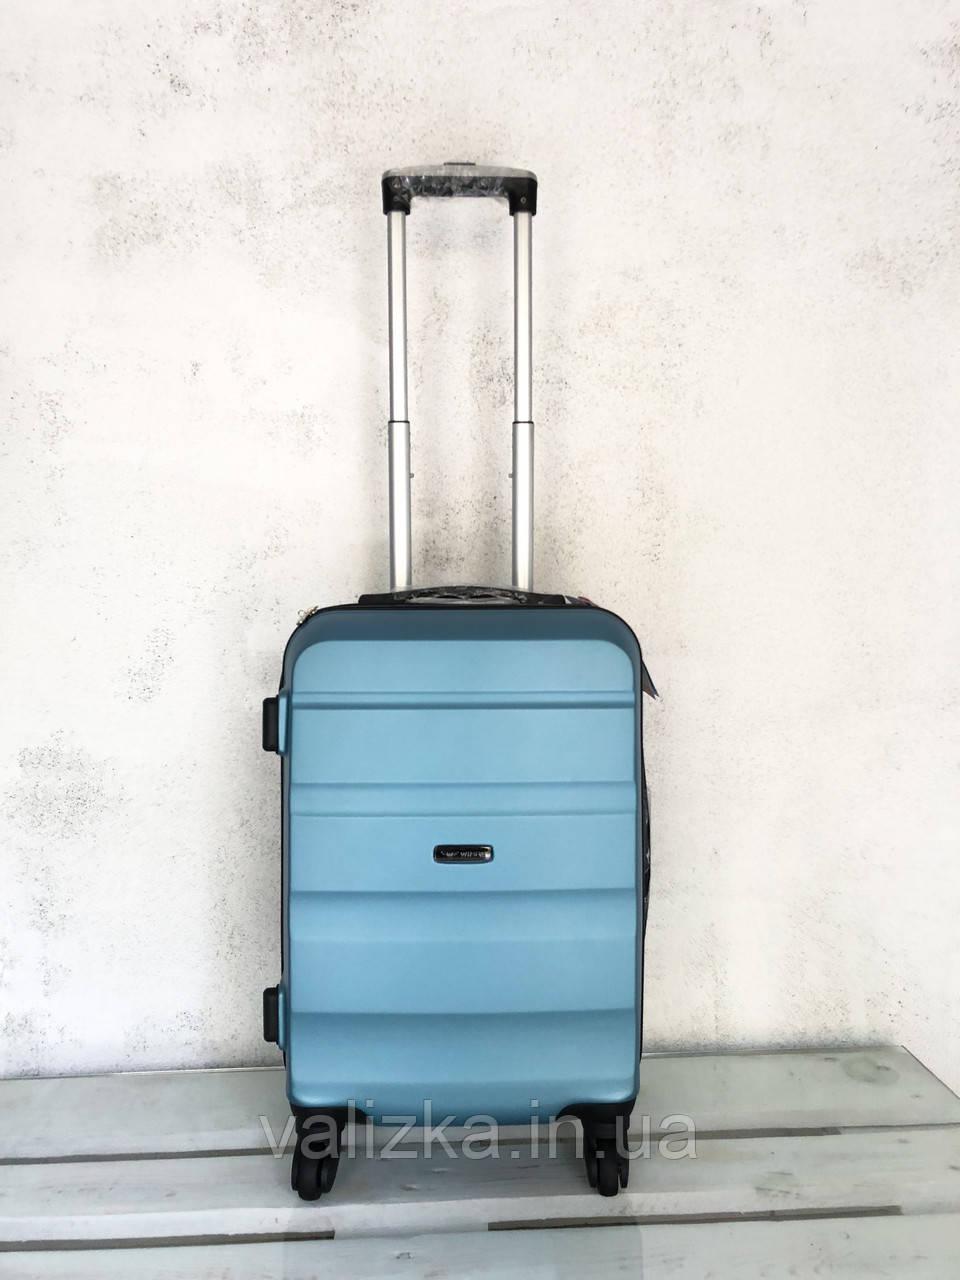 Чемодан из поликарбоната ручная кладь S+, чемодан голубой Польша / Валіза з полікарбонату ручна поклажка